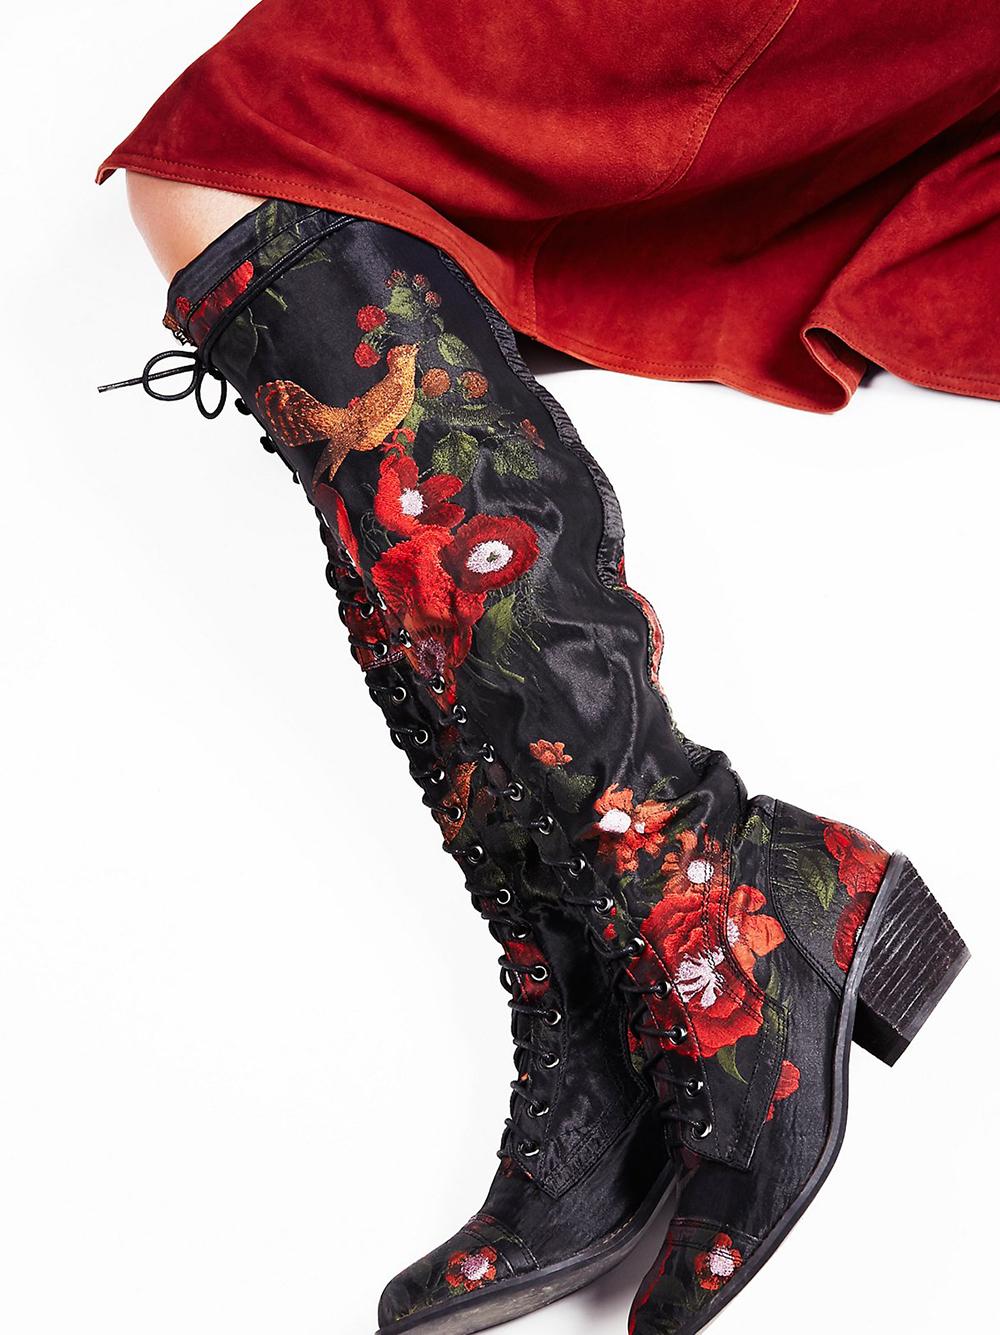 Jeffrey Campbell Floral Joe Lace Up Boot - Statement shoes